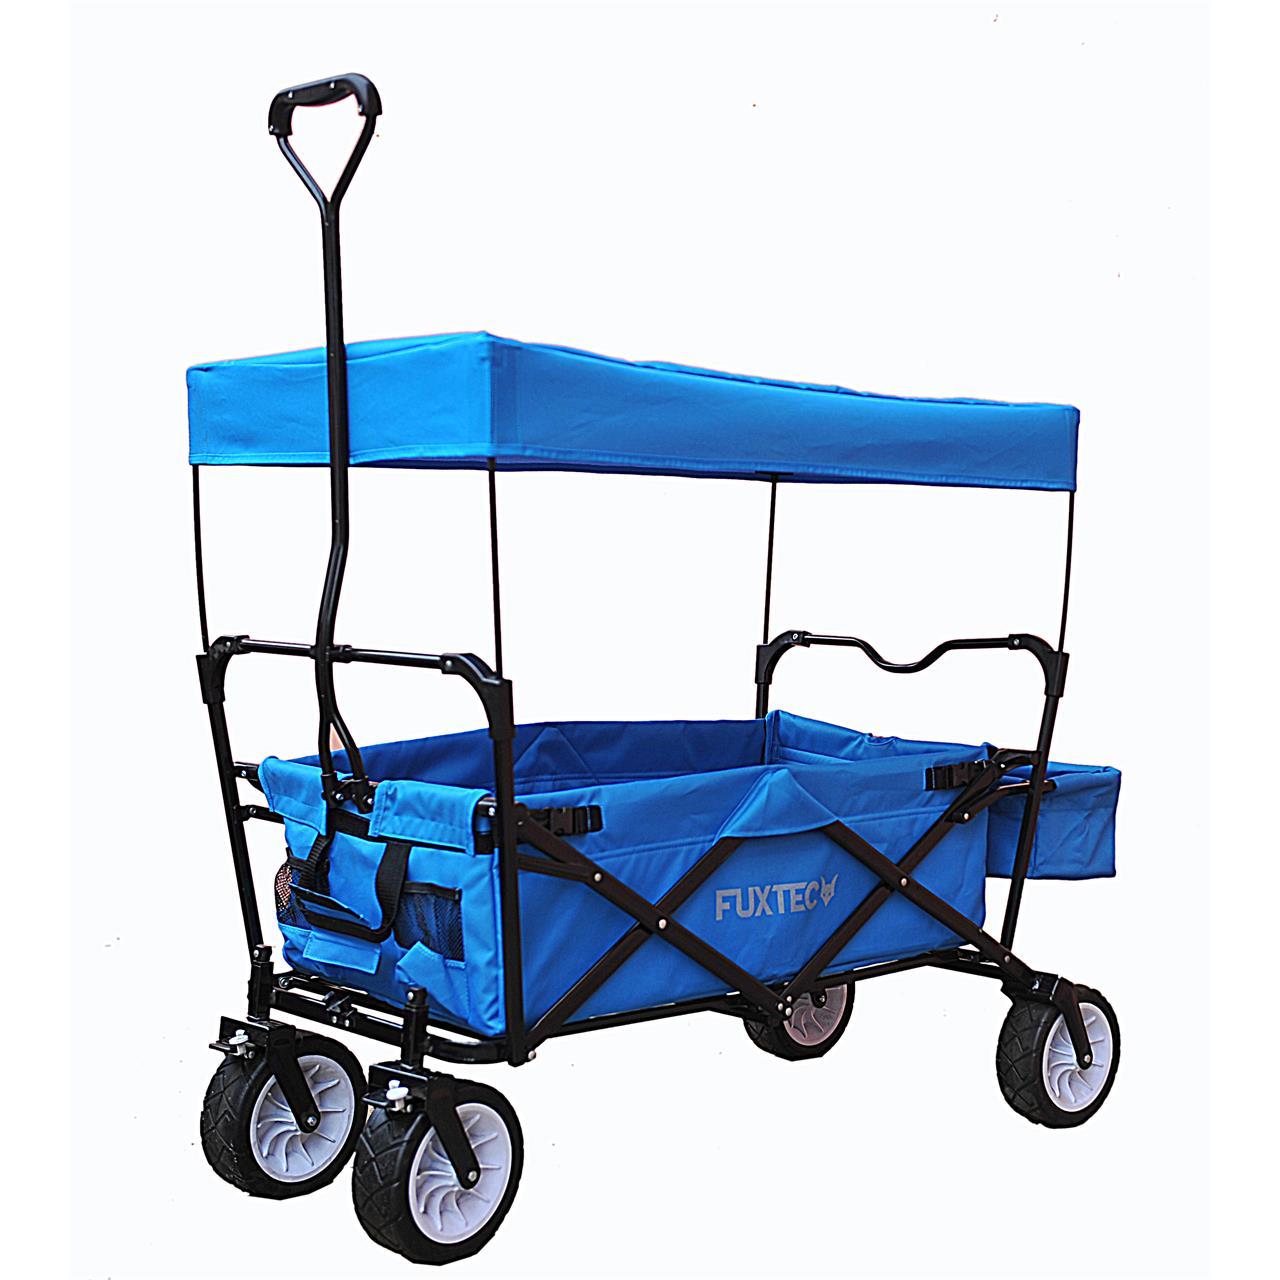 fuxtec bollerwagen fx bw 100 blau faltbar fuxtec marken bollerwagen transportwagen. Black Bedroom Furniture Sets. Home Design Ideas